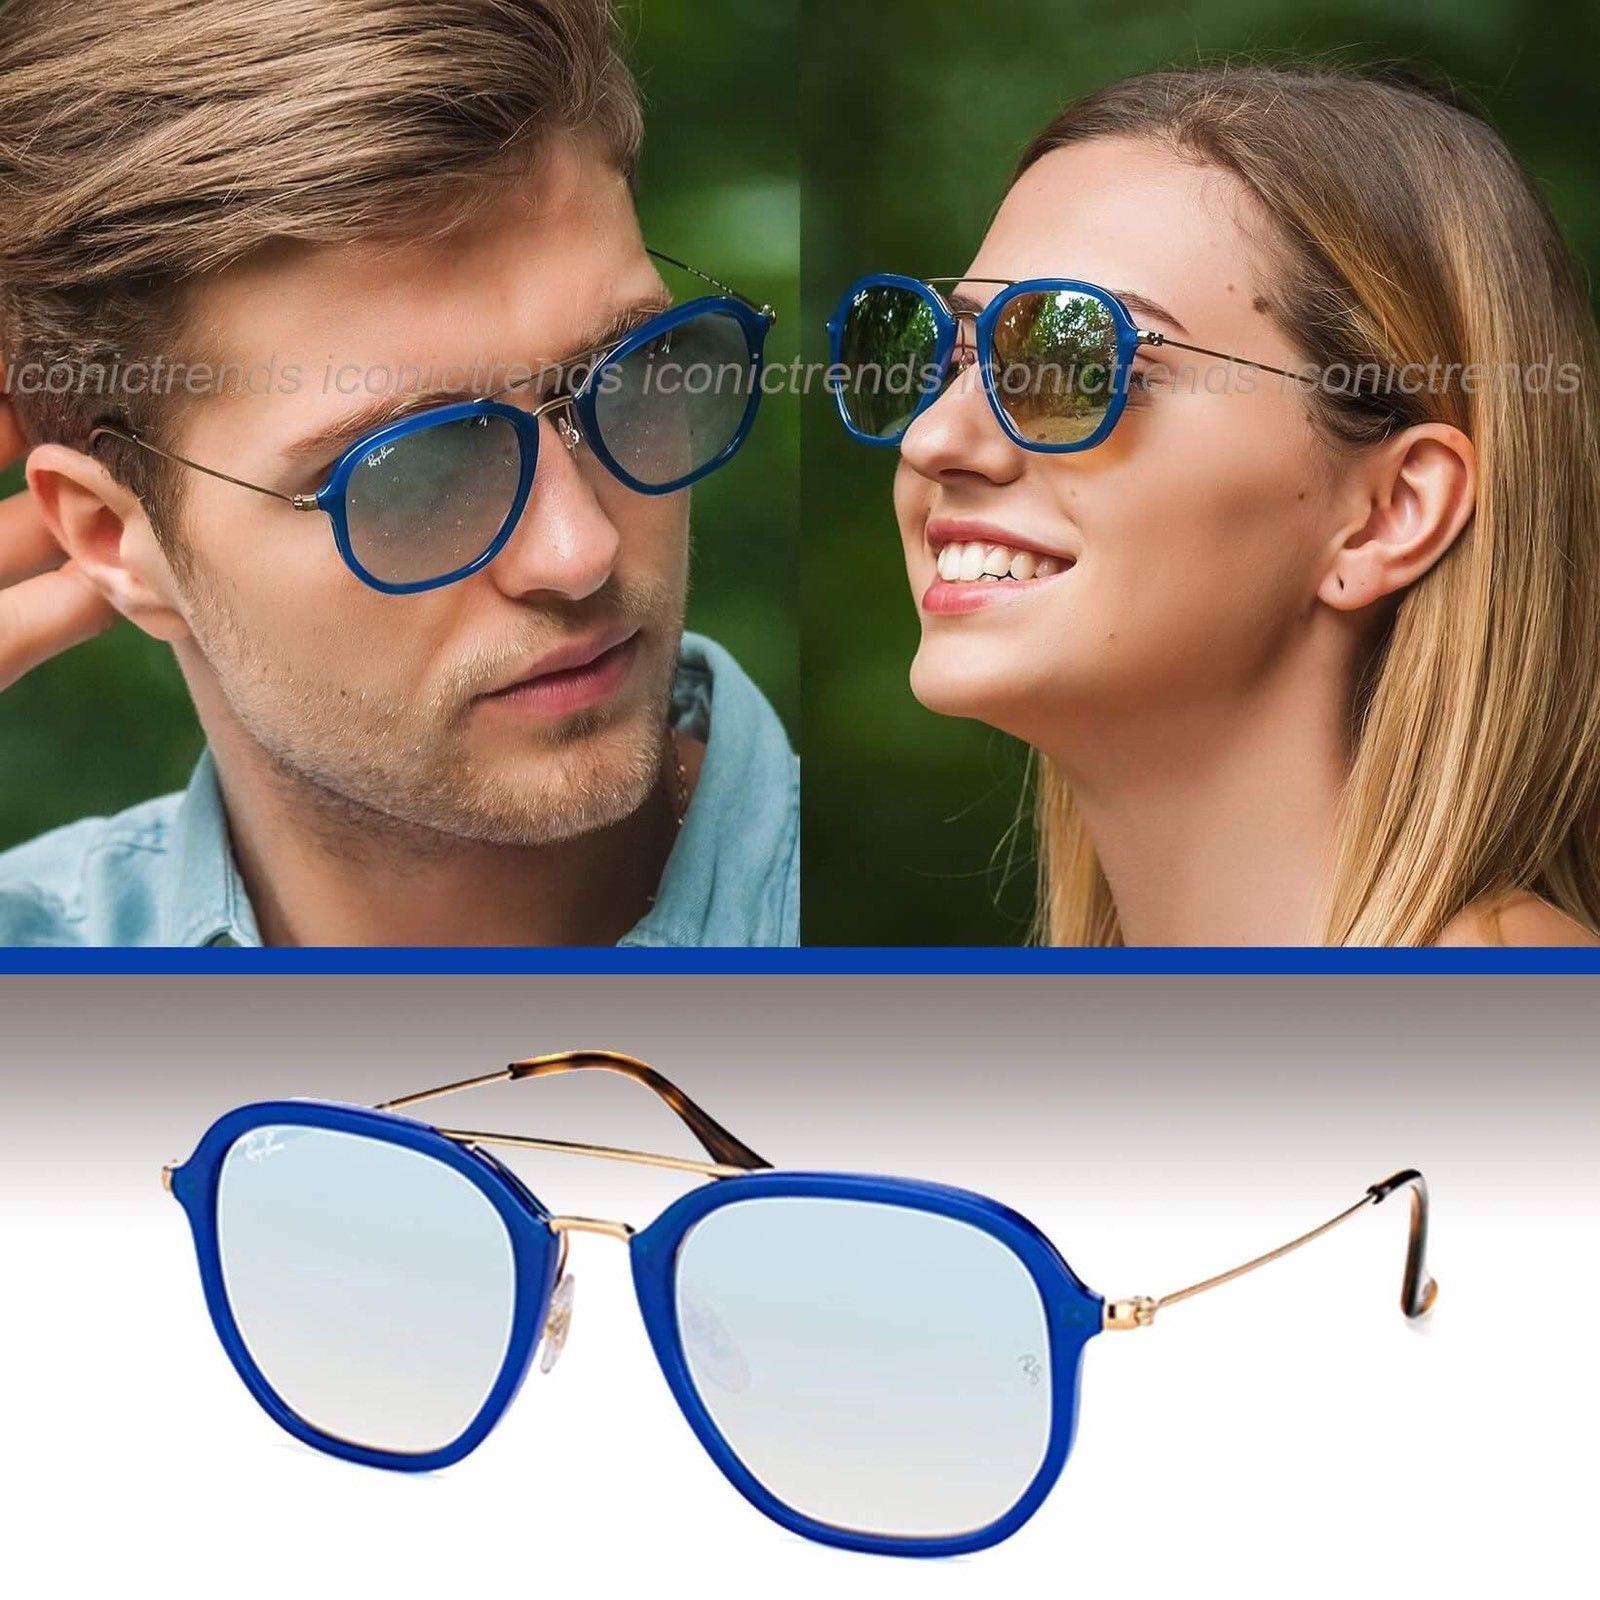 bd0be9816fa NWT Ray Ban RB4273 6259 9U 52 Aviator Sunglasses Blue Silver Gradient  FlashLens